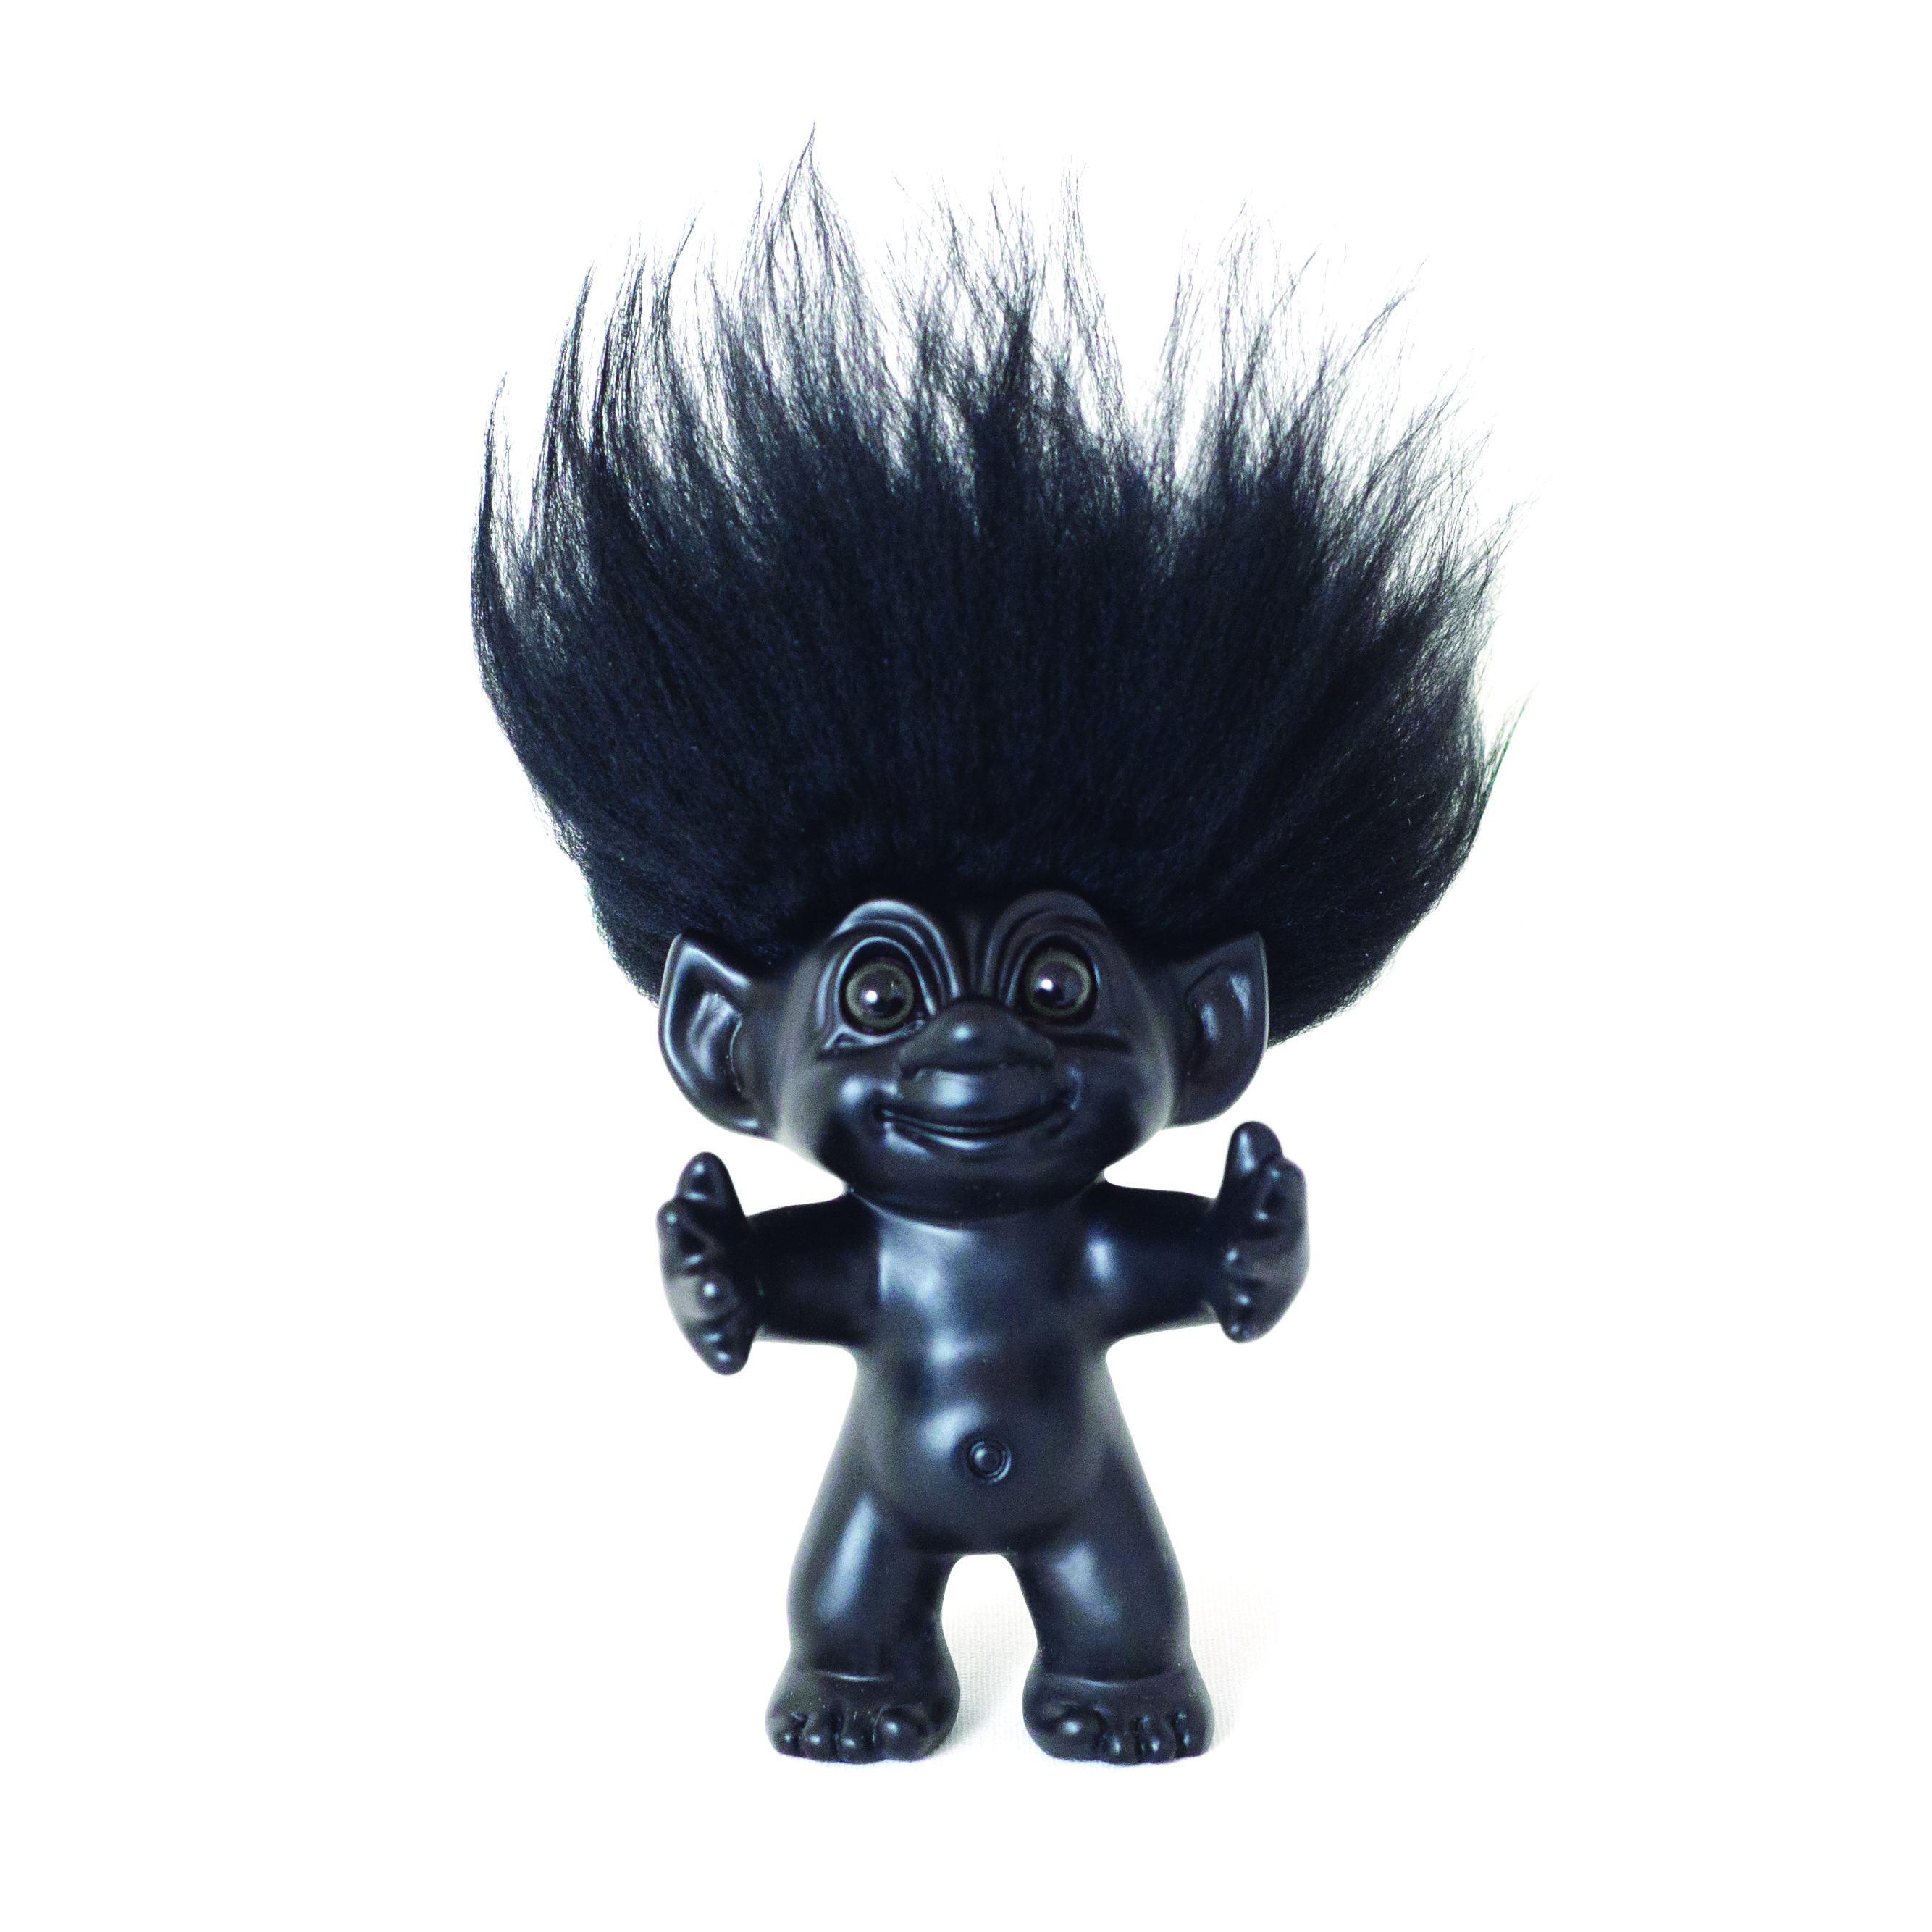 Good Luck Troll - Gjøl Trold 12 cm. - Black/Black (93024)